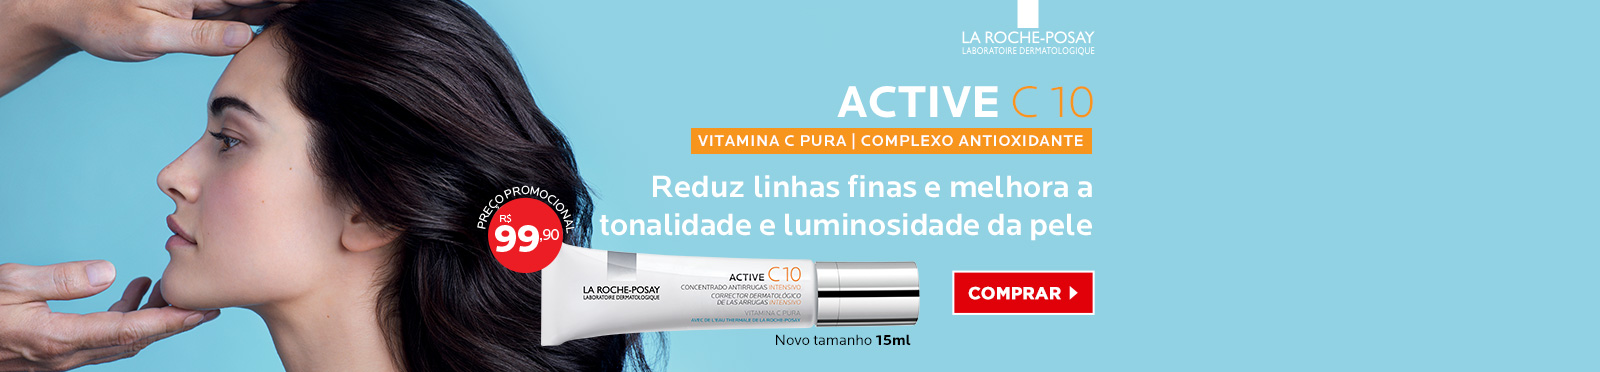 lancamento-active-c10-la-roche-posay-anti-envelhecimento-pele